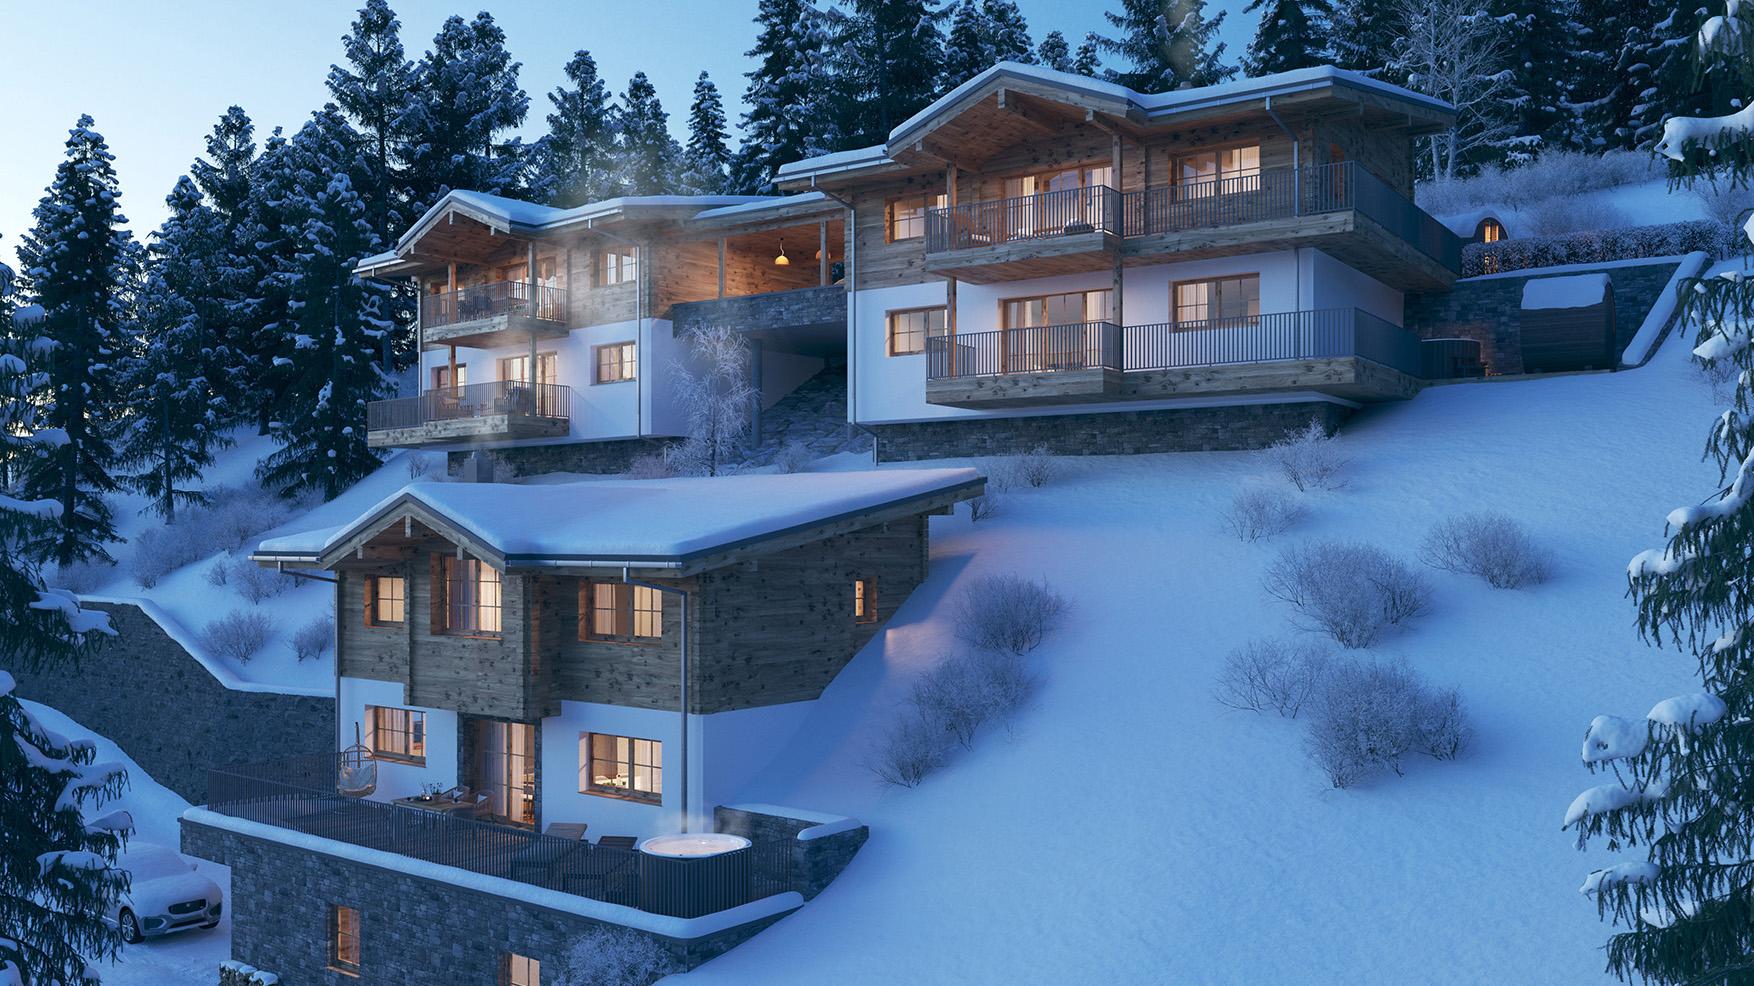 Karwendel Chalets Chalet, Austria